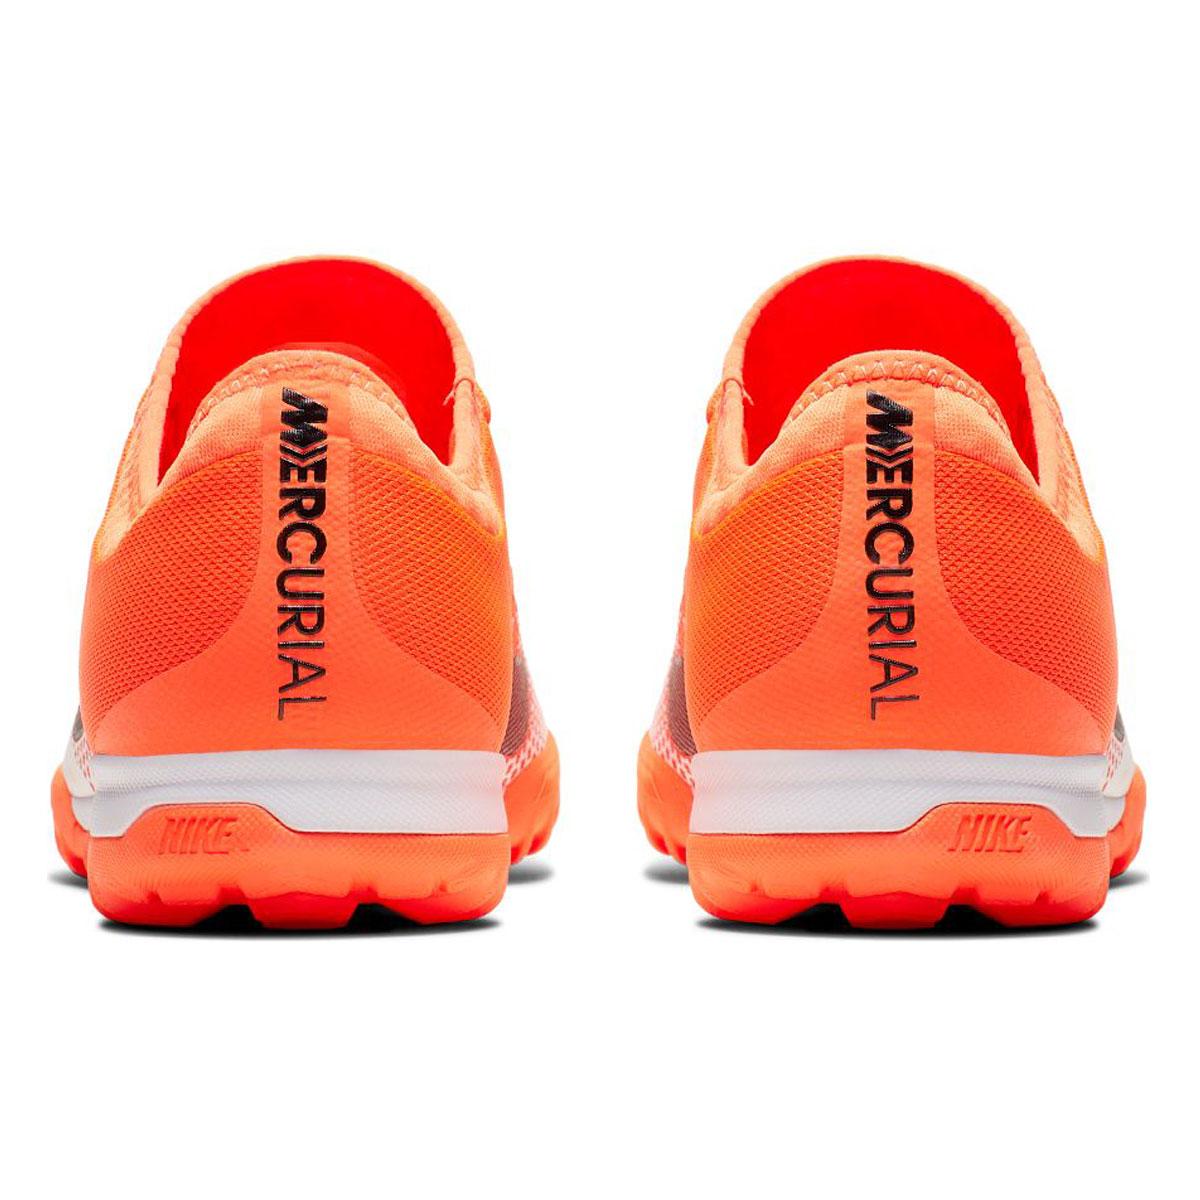 new arrival 15573 263f4 Nike Fußballschuh Mercurial VaporX XII Pro TF Kunstrasen orange/weiß